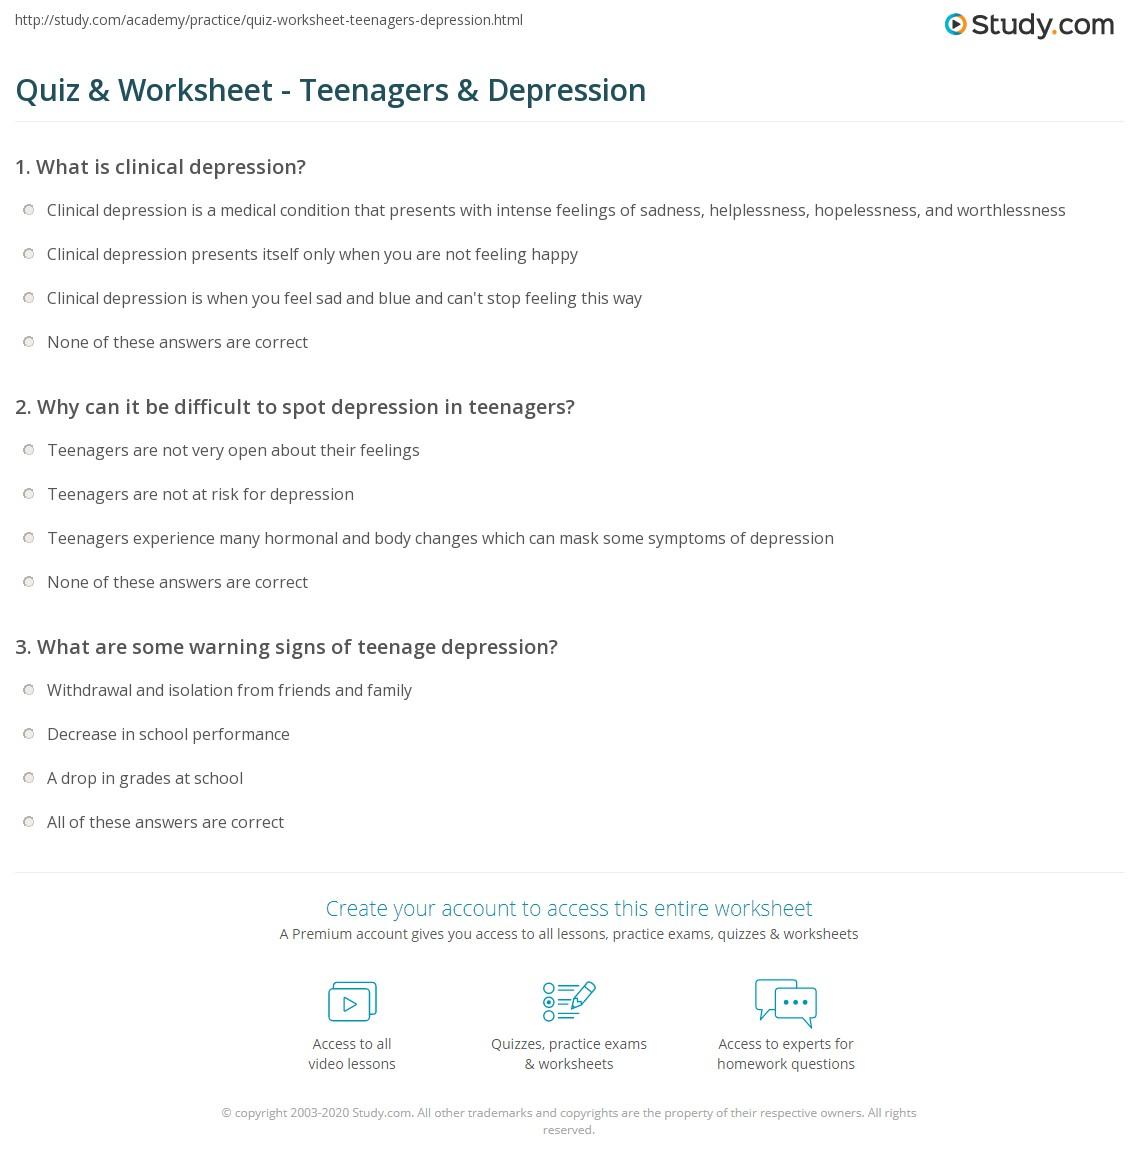 Quiz & Worksheet - Teenagers & Depression | Study.com